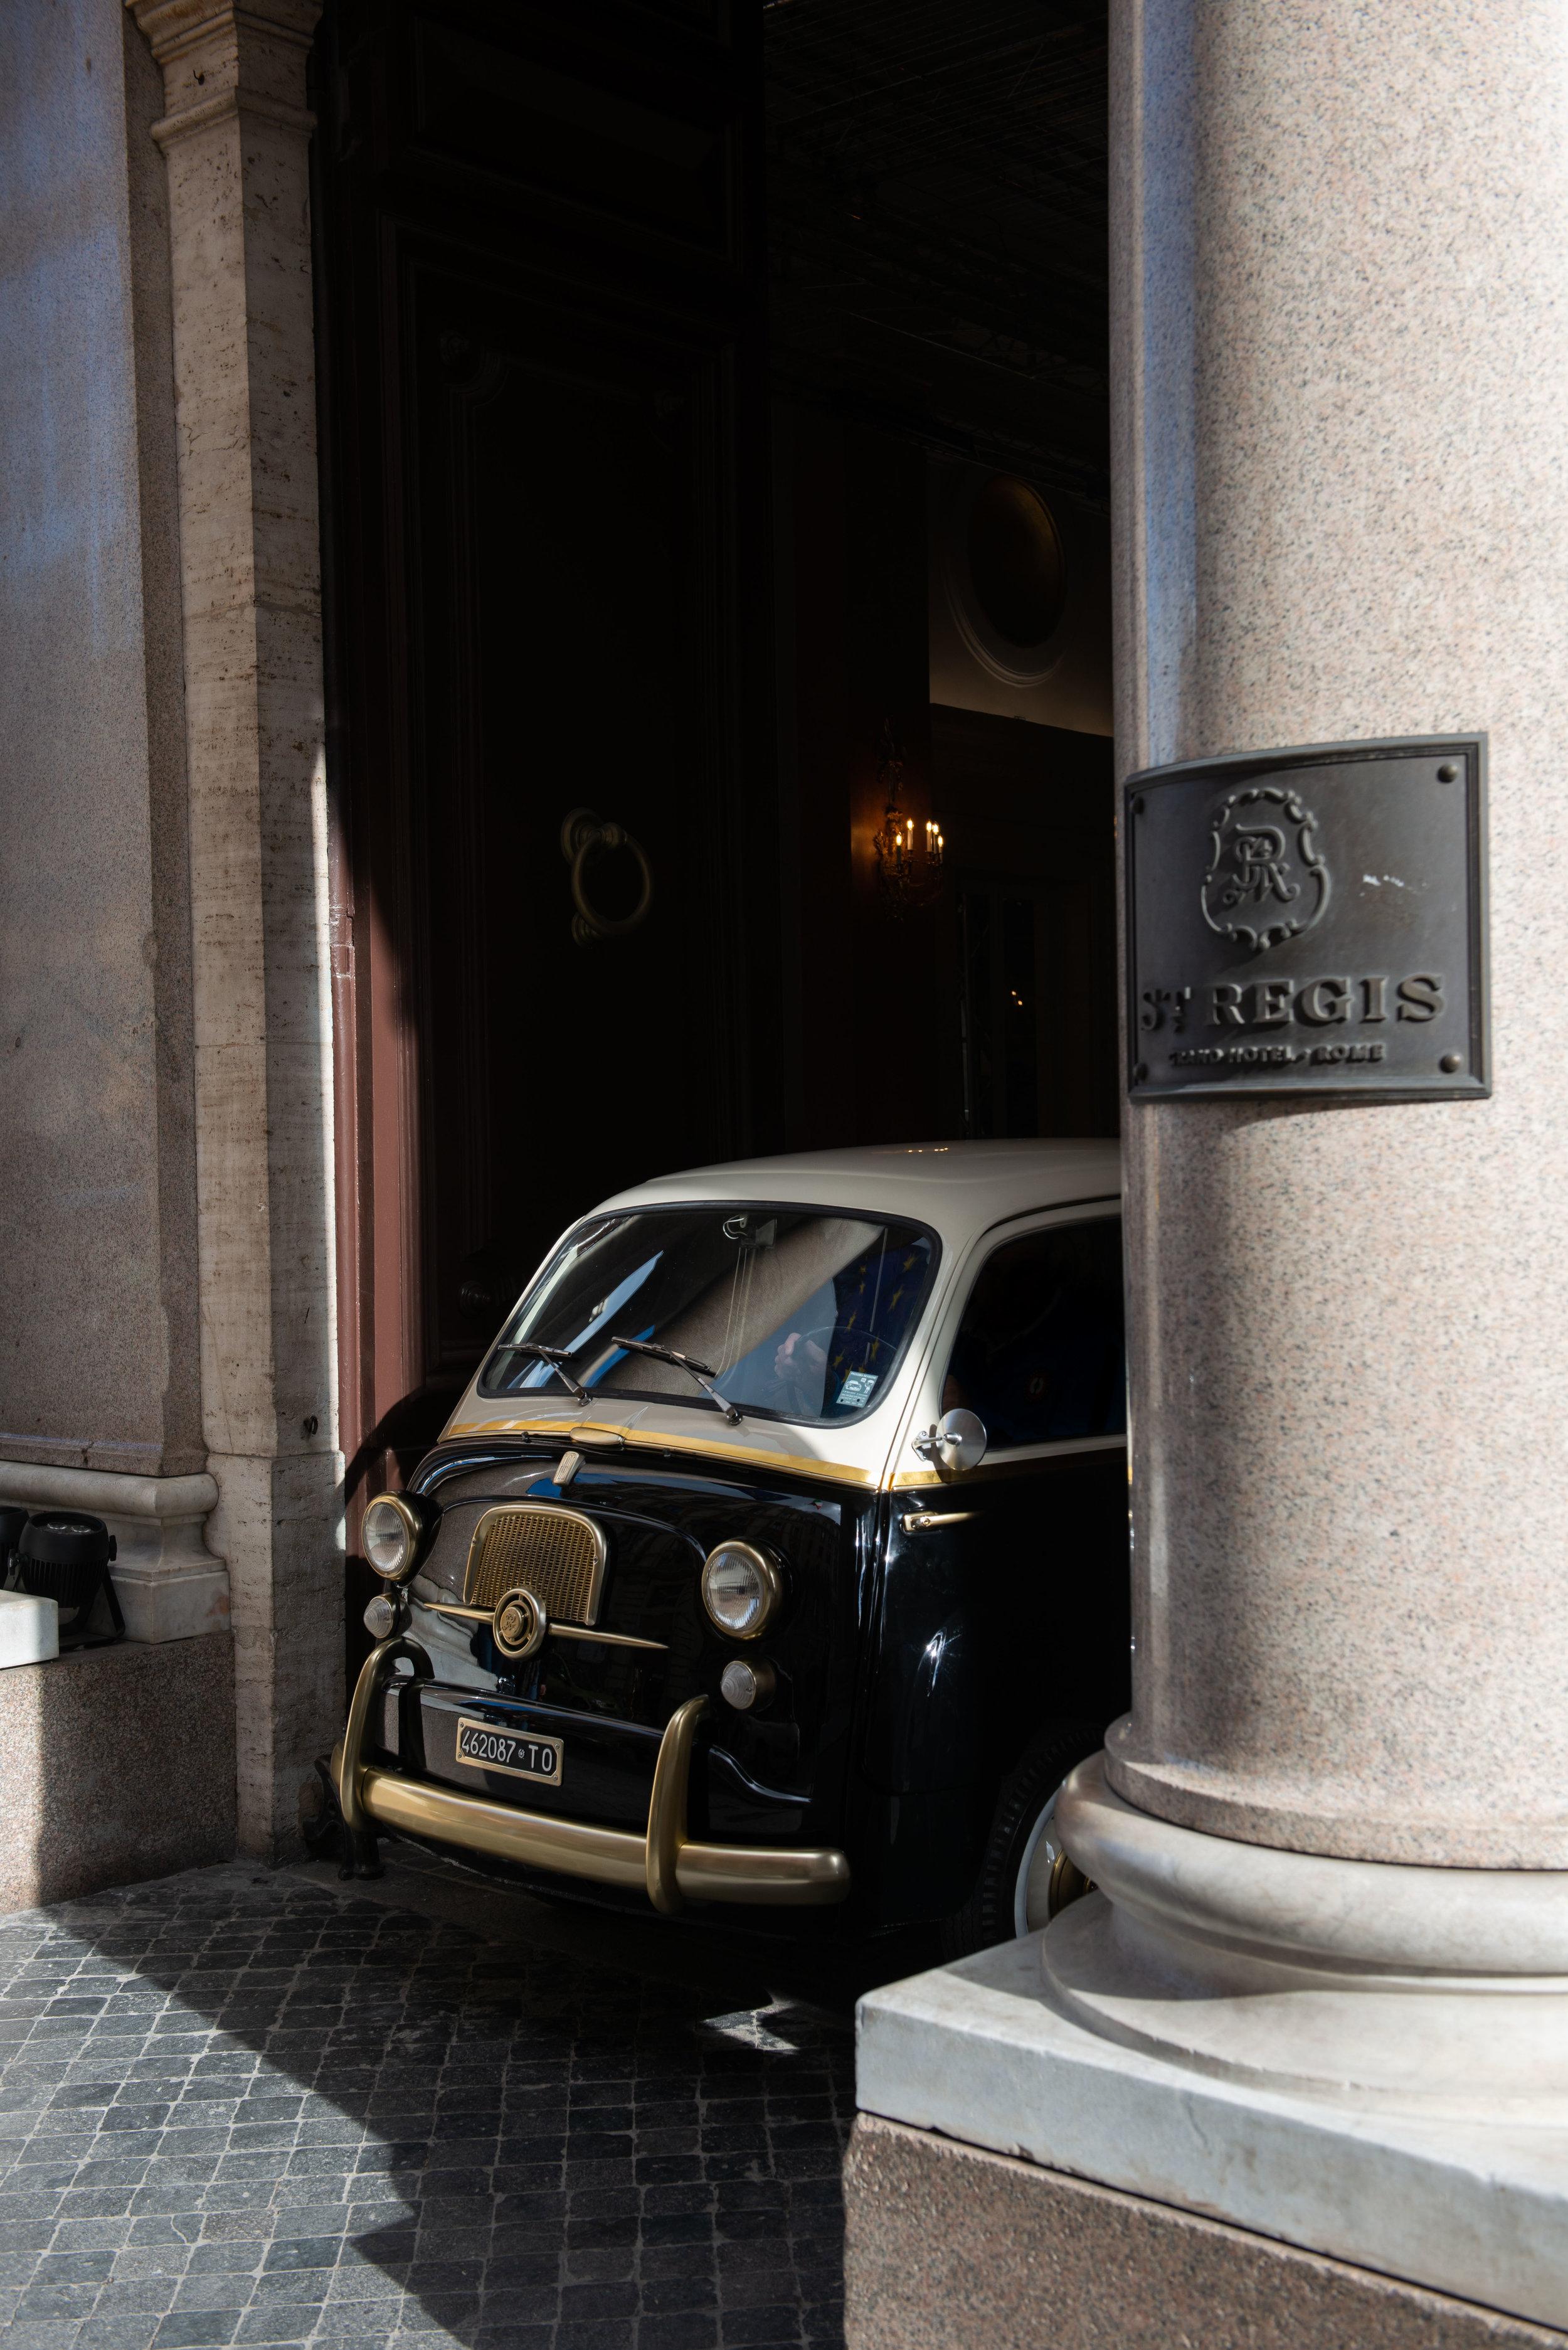 The custom 1962 Fiat 600 at St Regis Rome